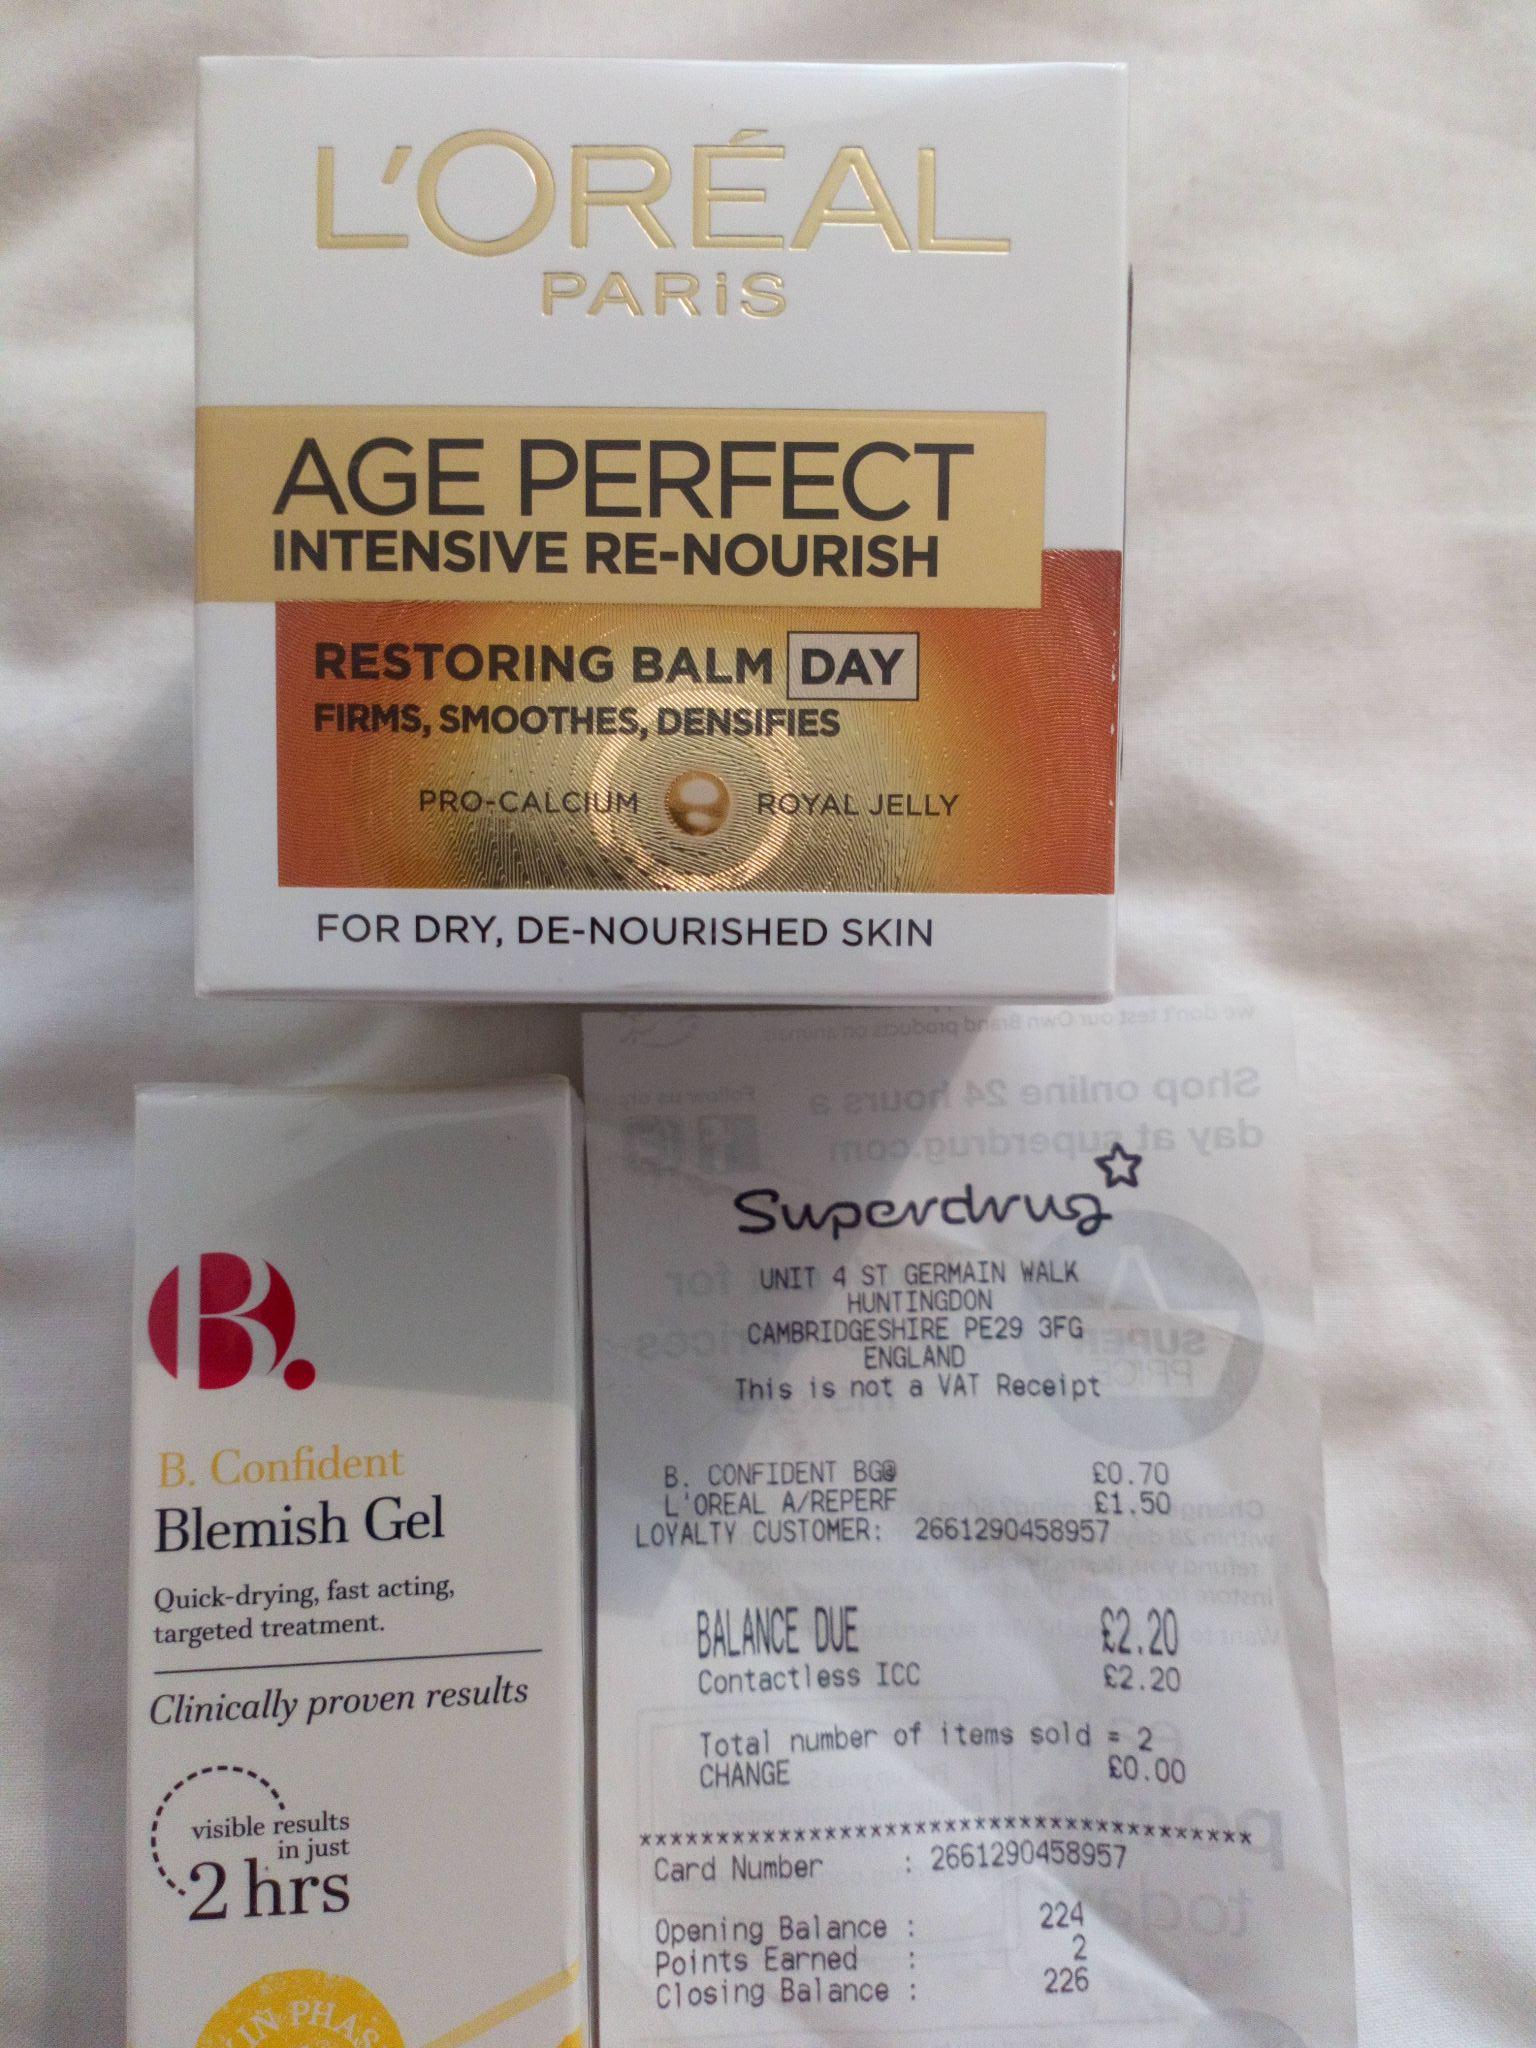 L'Oréal age perfect intensive re-nourish (day) - £1.50 instore @ Superdrug